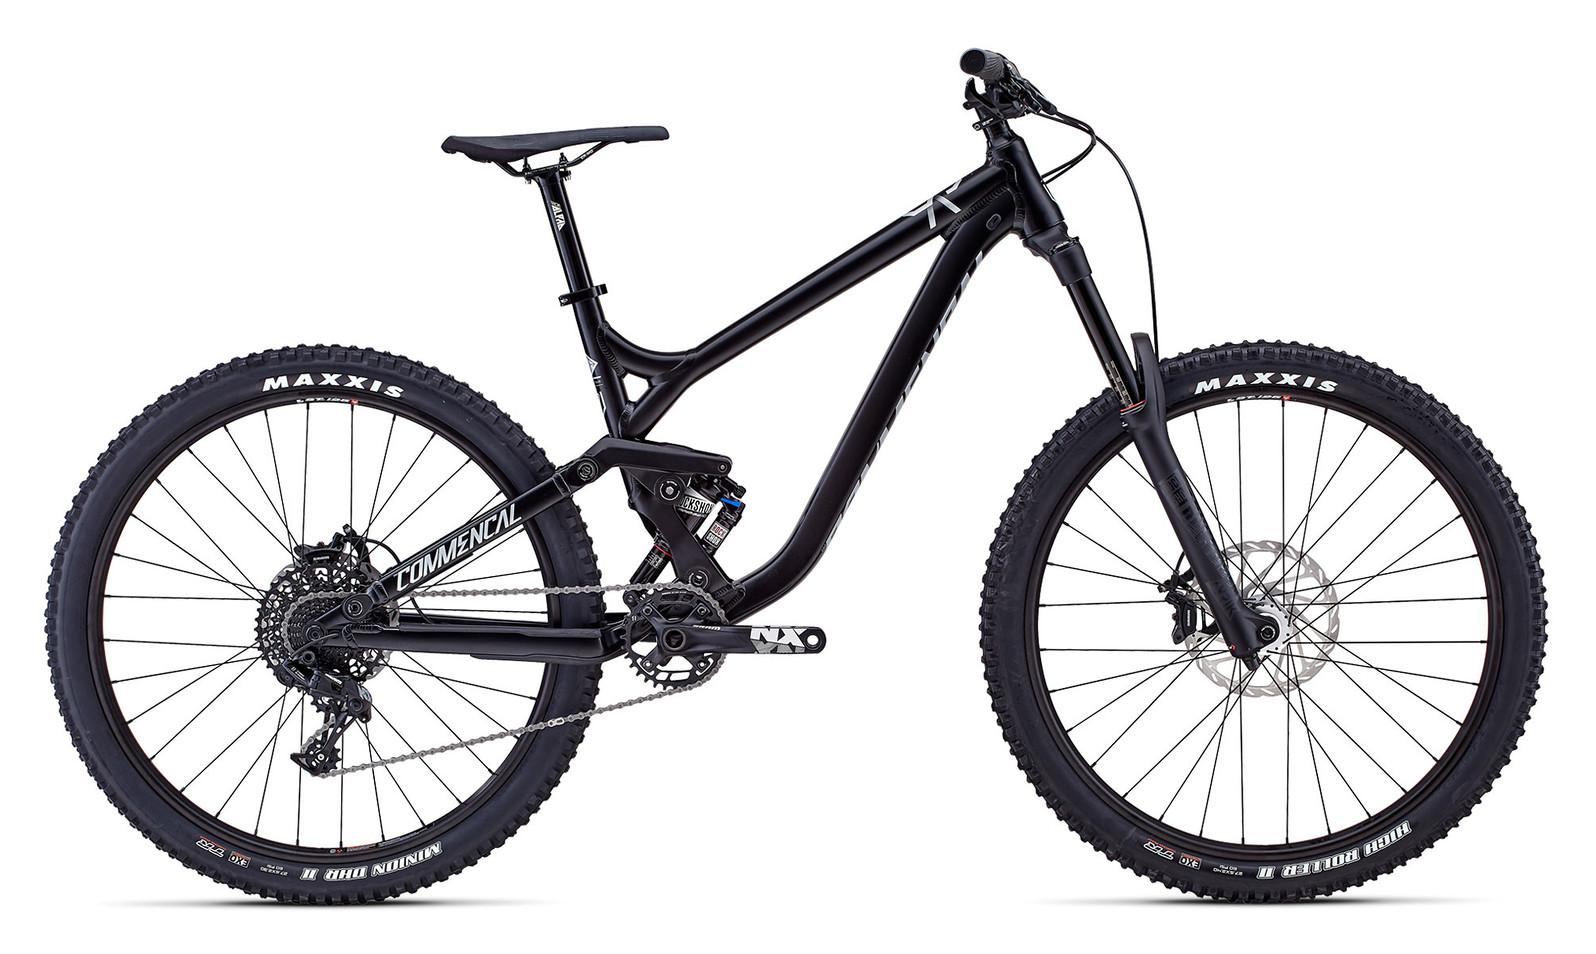 2018 Commencal Meta SX V3 650b Bike - black